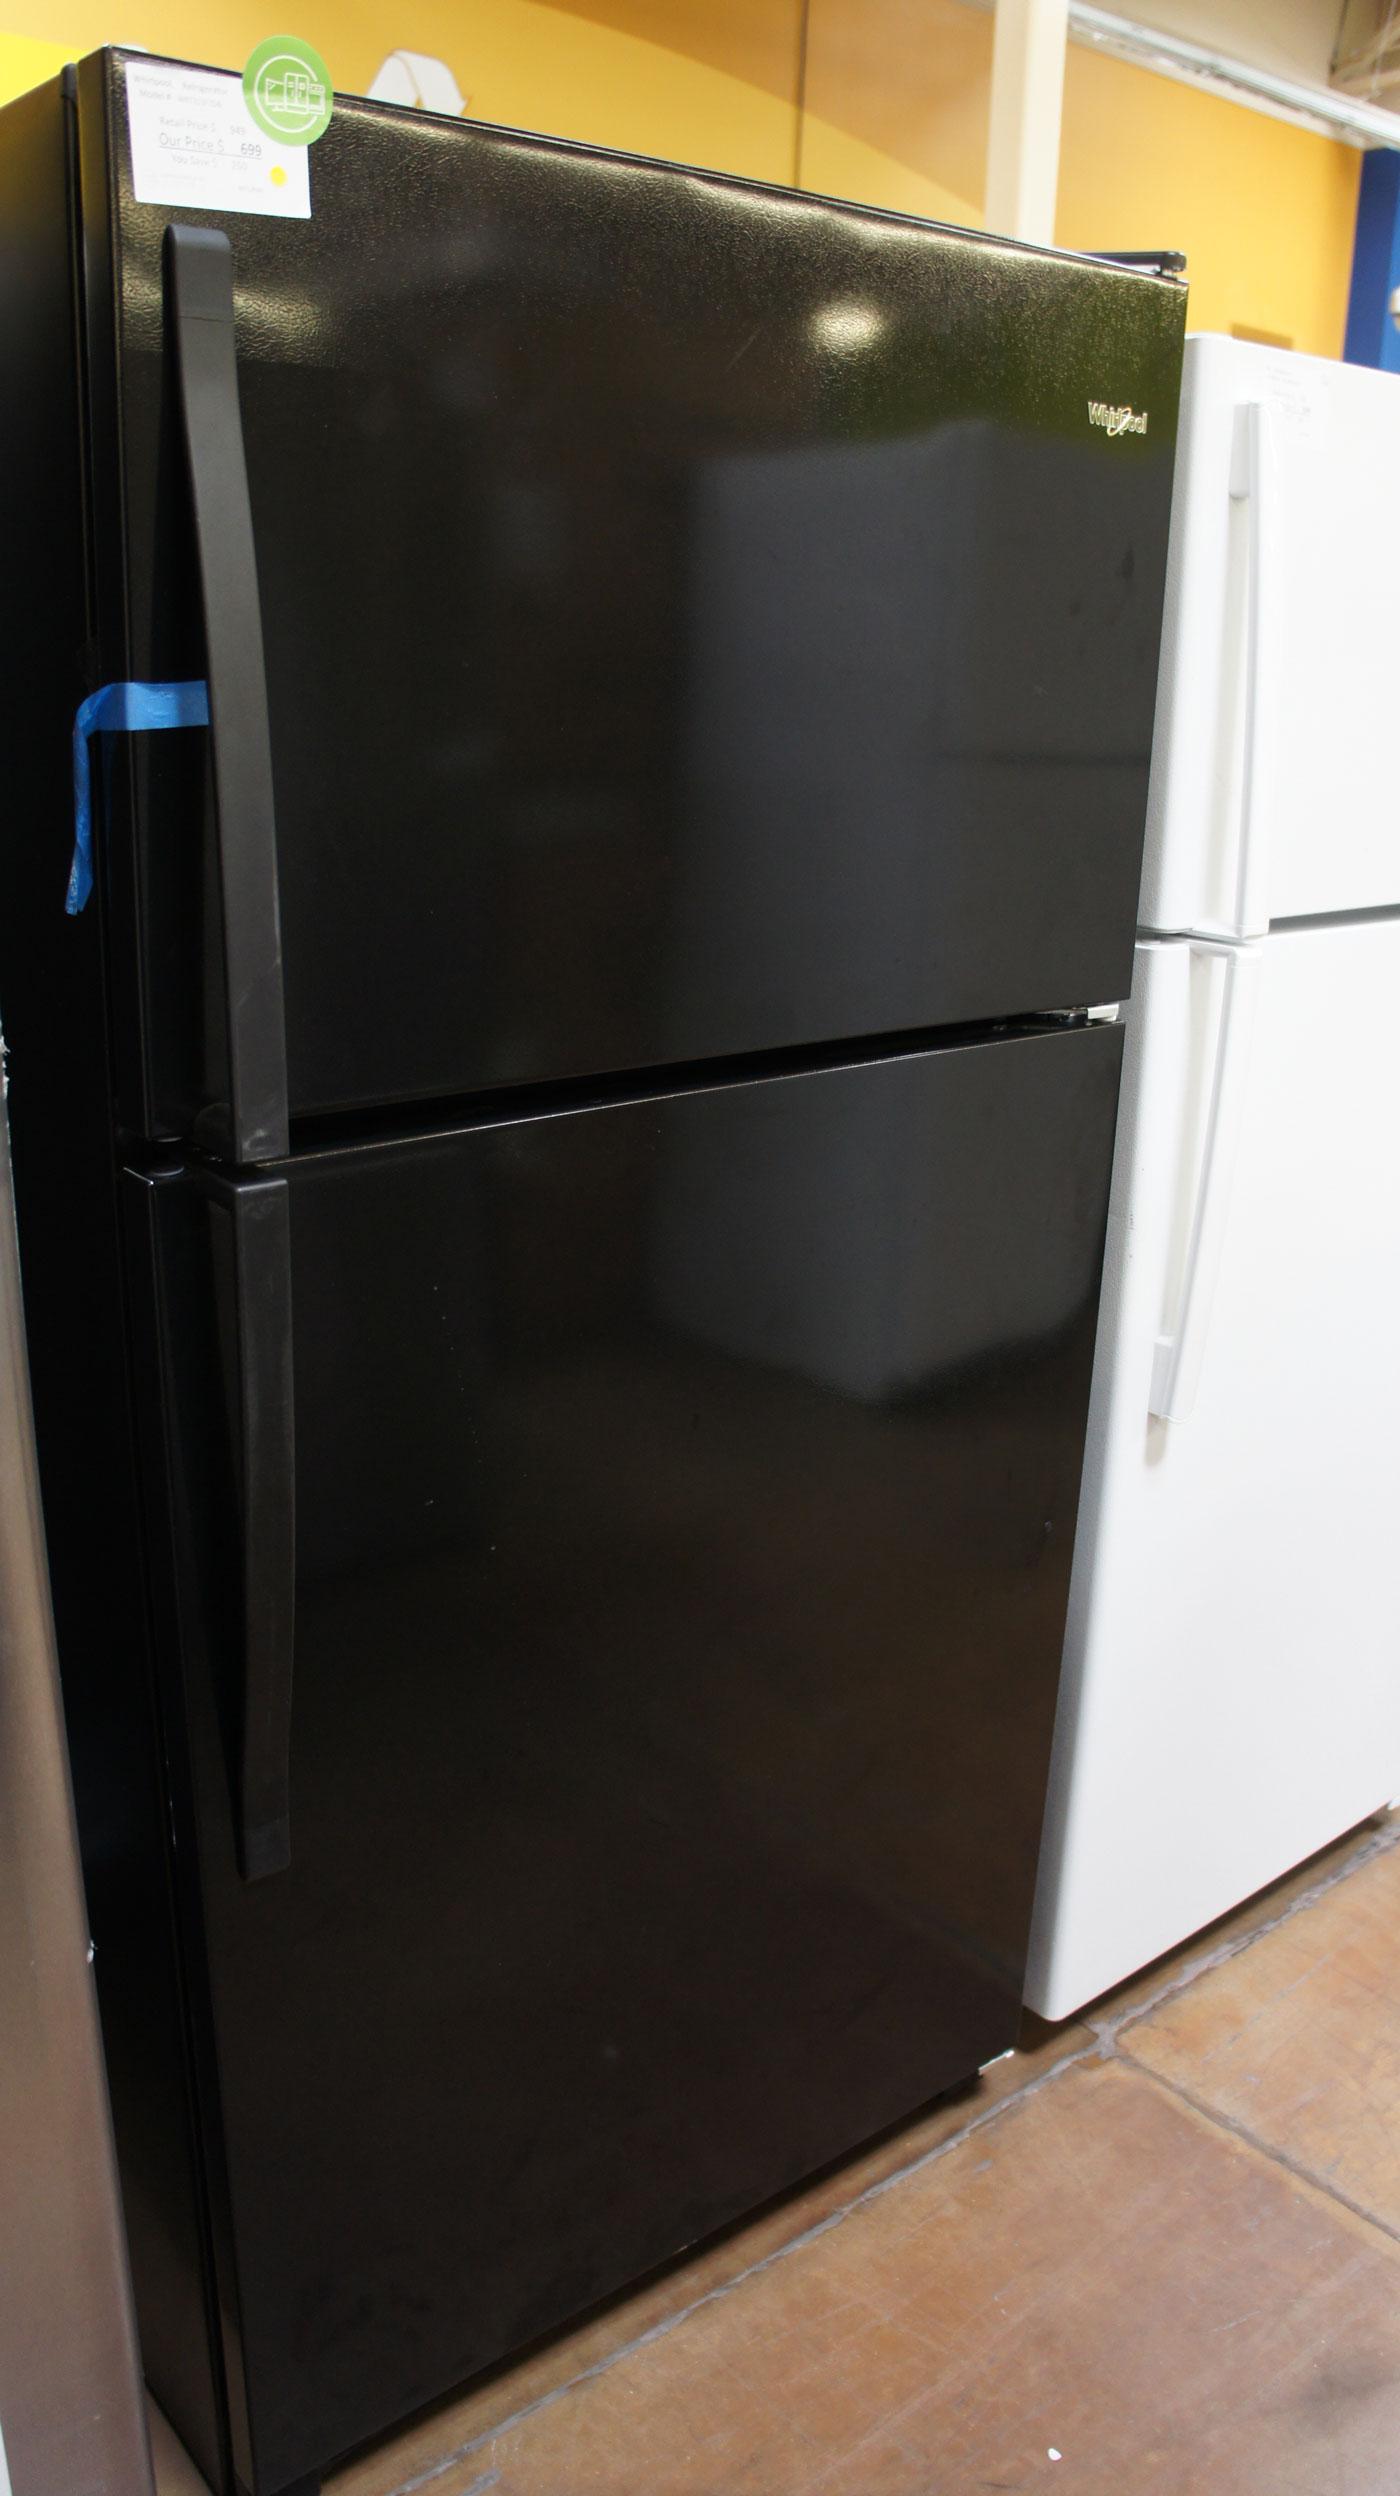 "33"" Whirlpool WRT311FZDB 20.5 cu.ft. Top-Freezer Refrigerator"